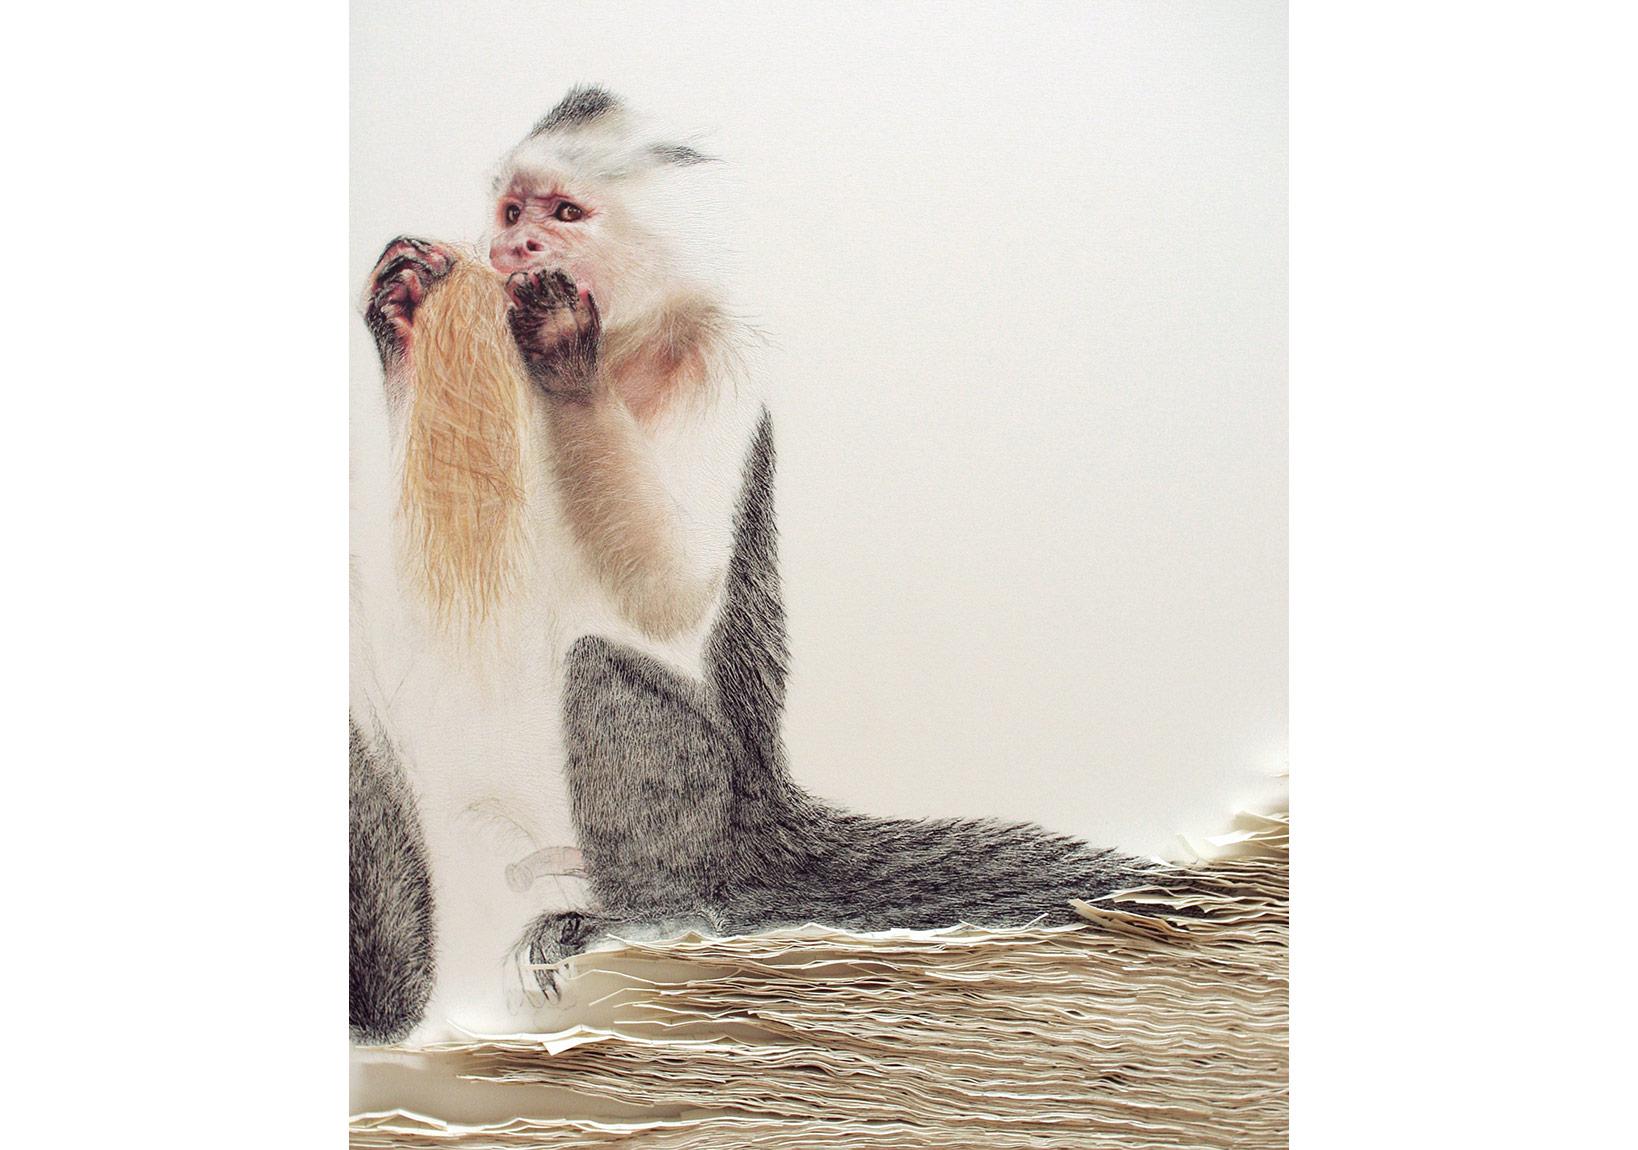 (Apo)tropaion #1 - Kağıt üzerine pastel, kağıt yara bantları, 215cm x 110cm x 4cm, detay ~60cm x 45cm x 4cm, 2012 - Copyright Svenja Schüffler